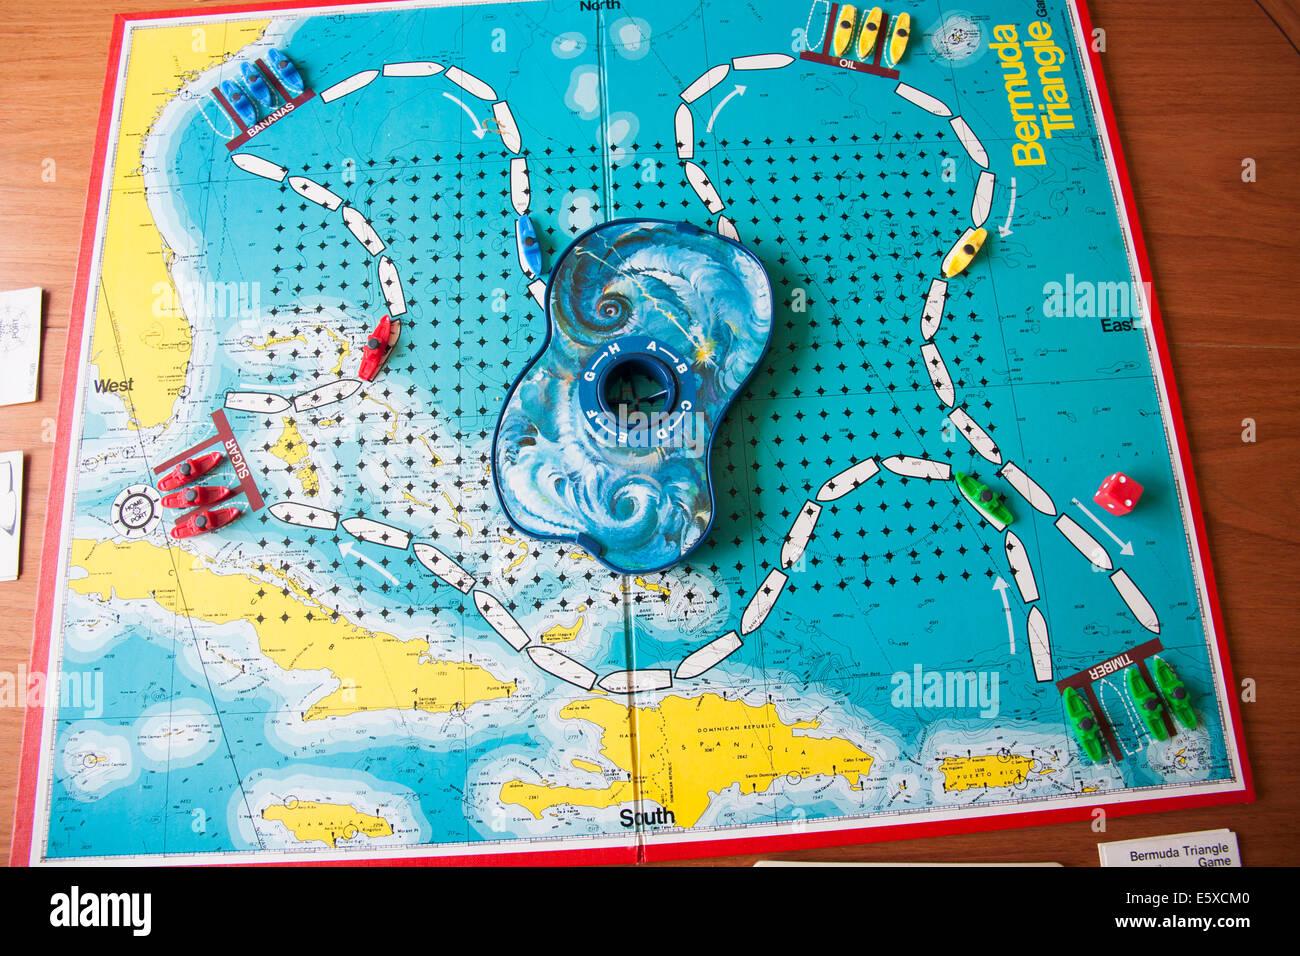 Bermuda Triangle Board Game Stock Photo